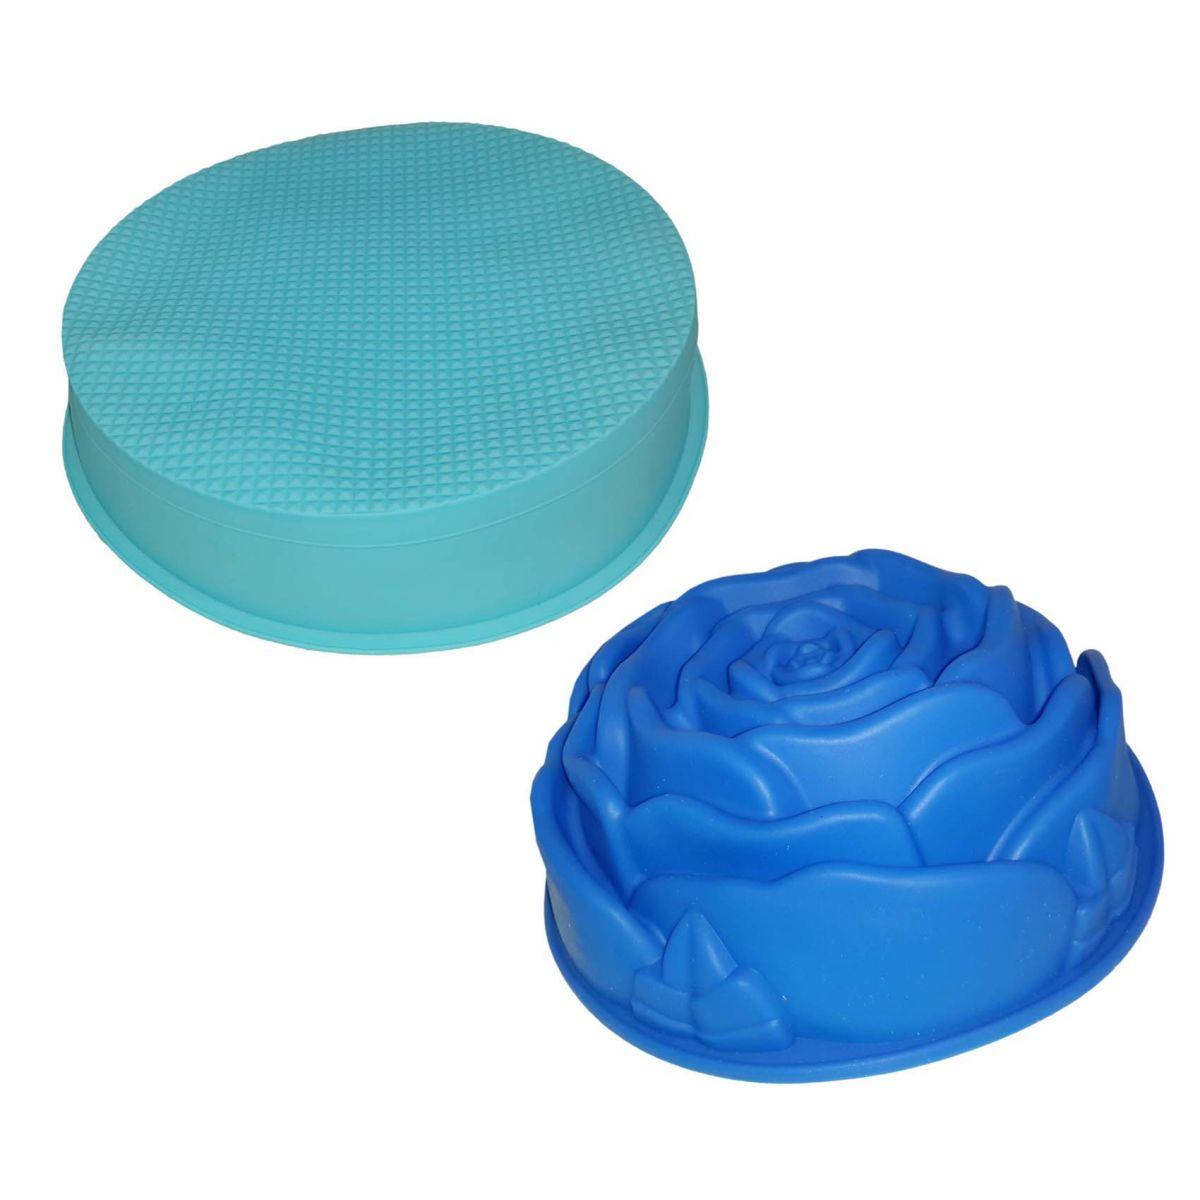 Conjunto Silicone Cozinha 2 Forma Doce Torta Flor Redonda Azul (kit2-sili-6-11)